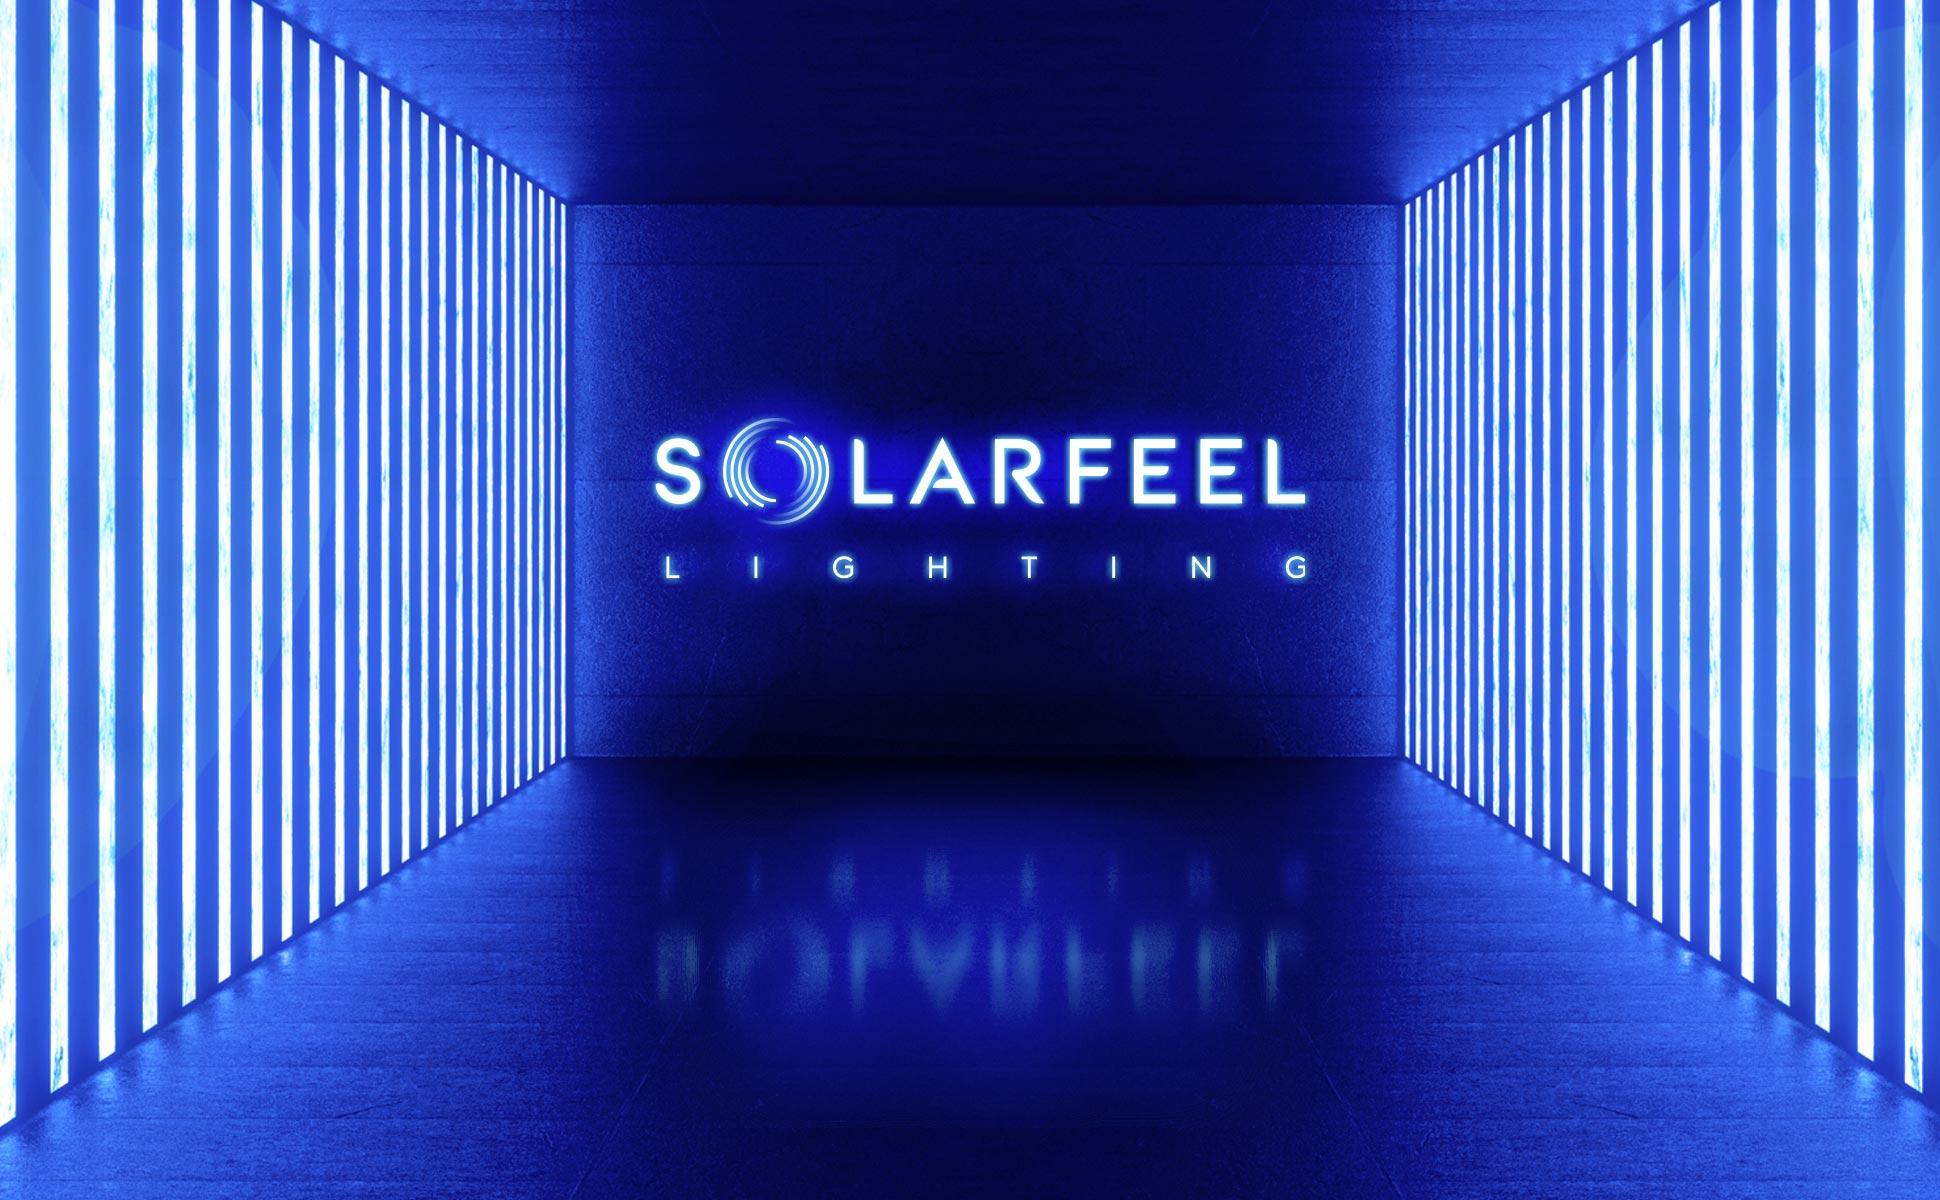 ikadia-portfolio-solarfeel-5